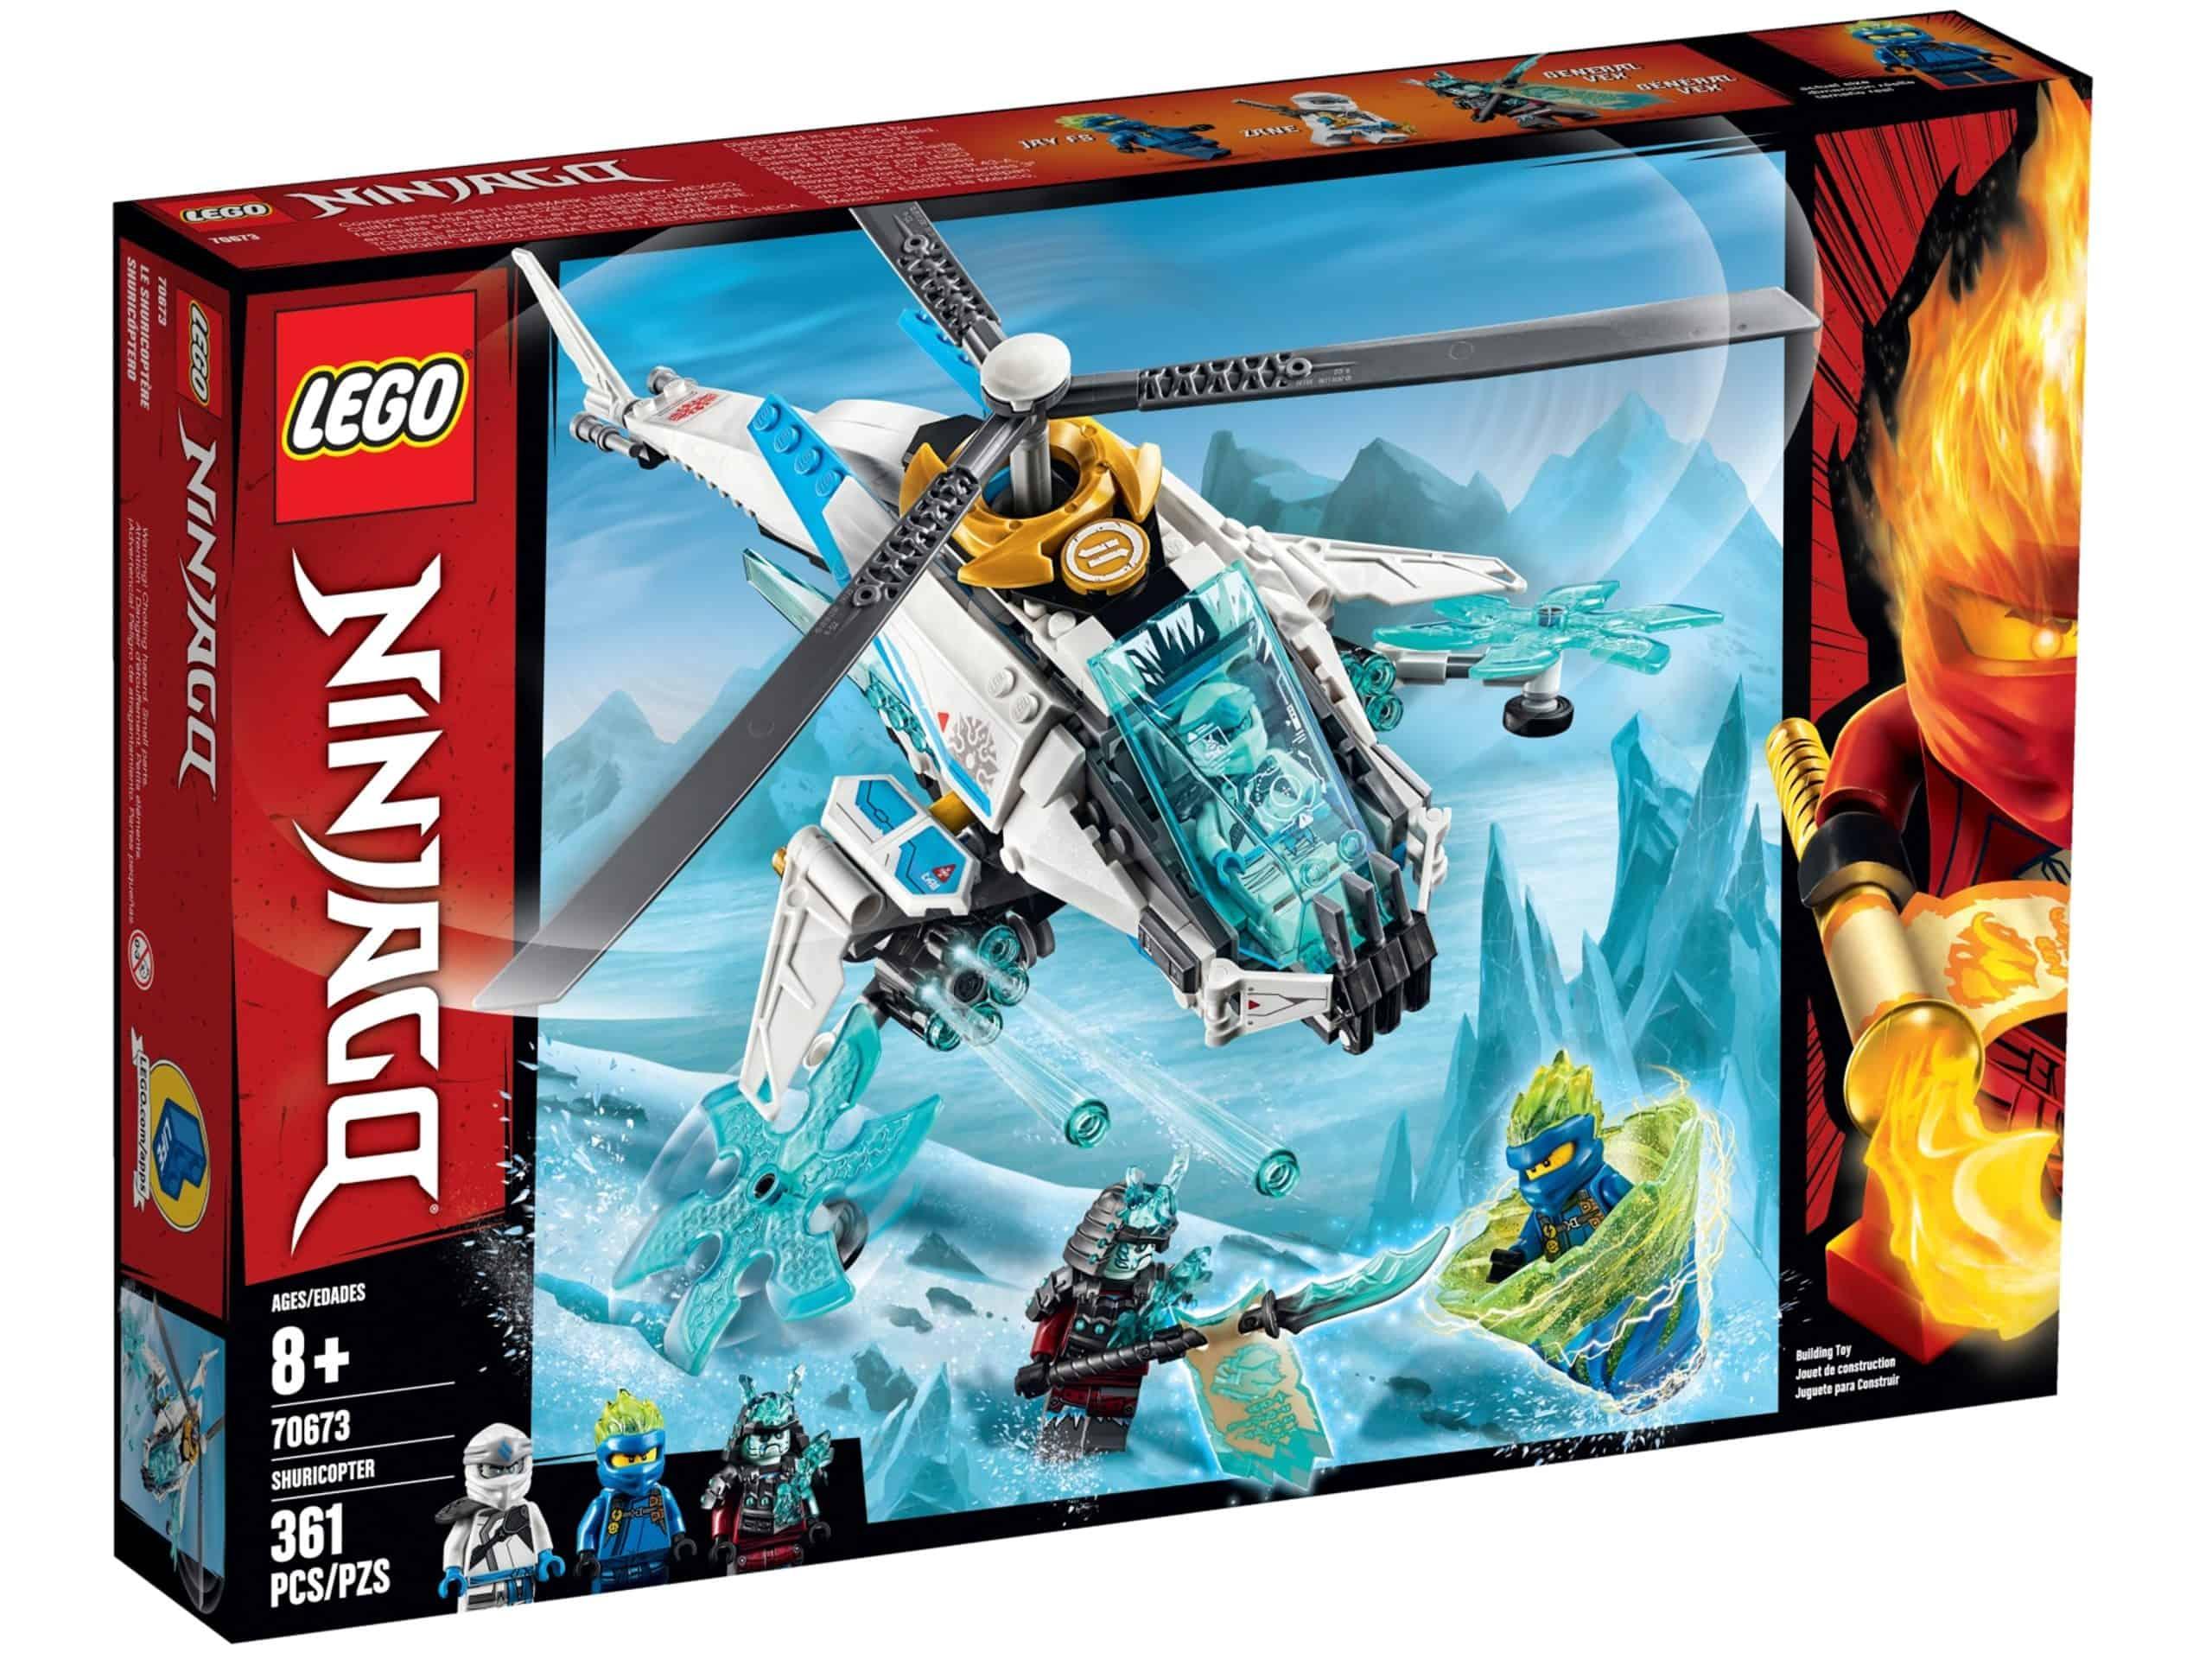 lego 70673 shurikopter scaled